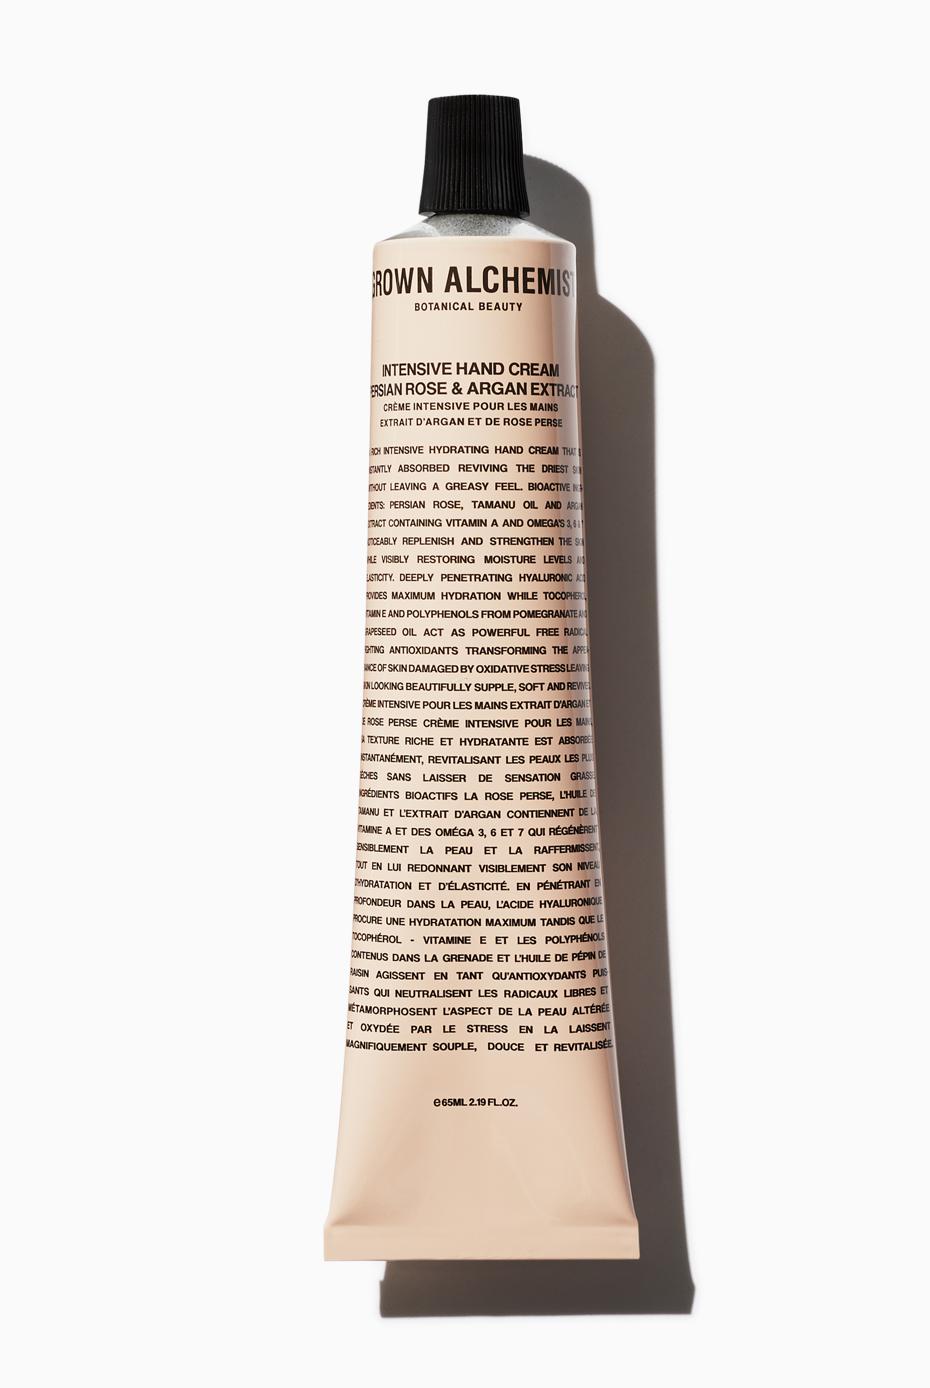 Intensive Hand Cream Persian Rose, Argan Extract 65ml-1